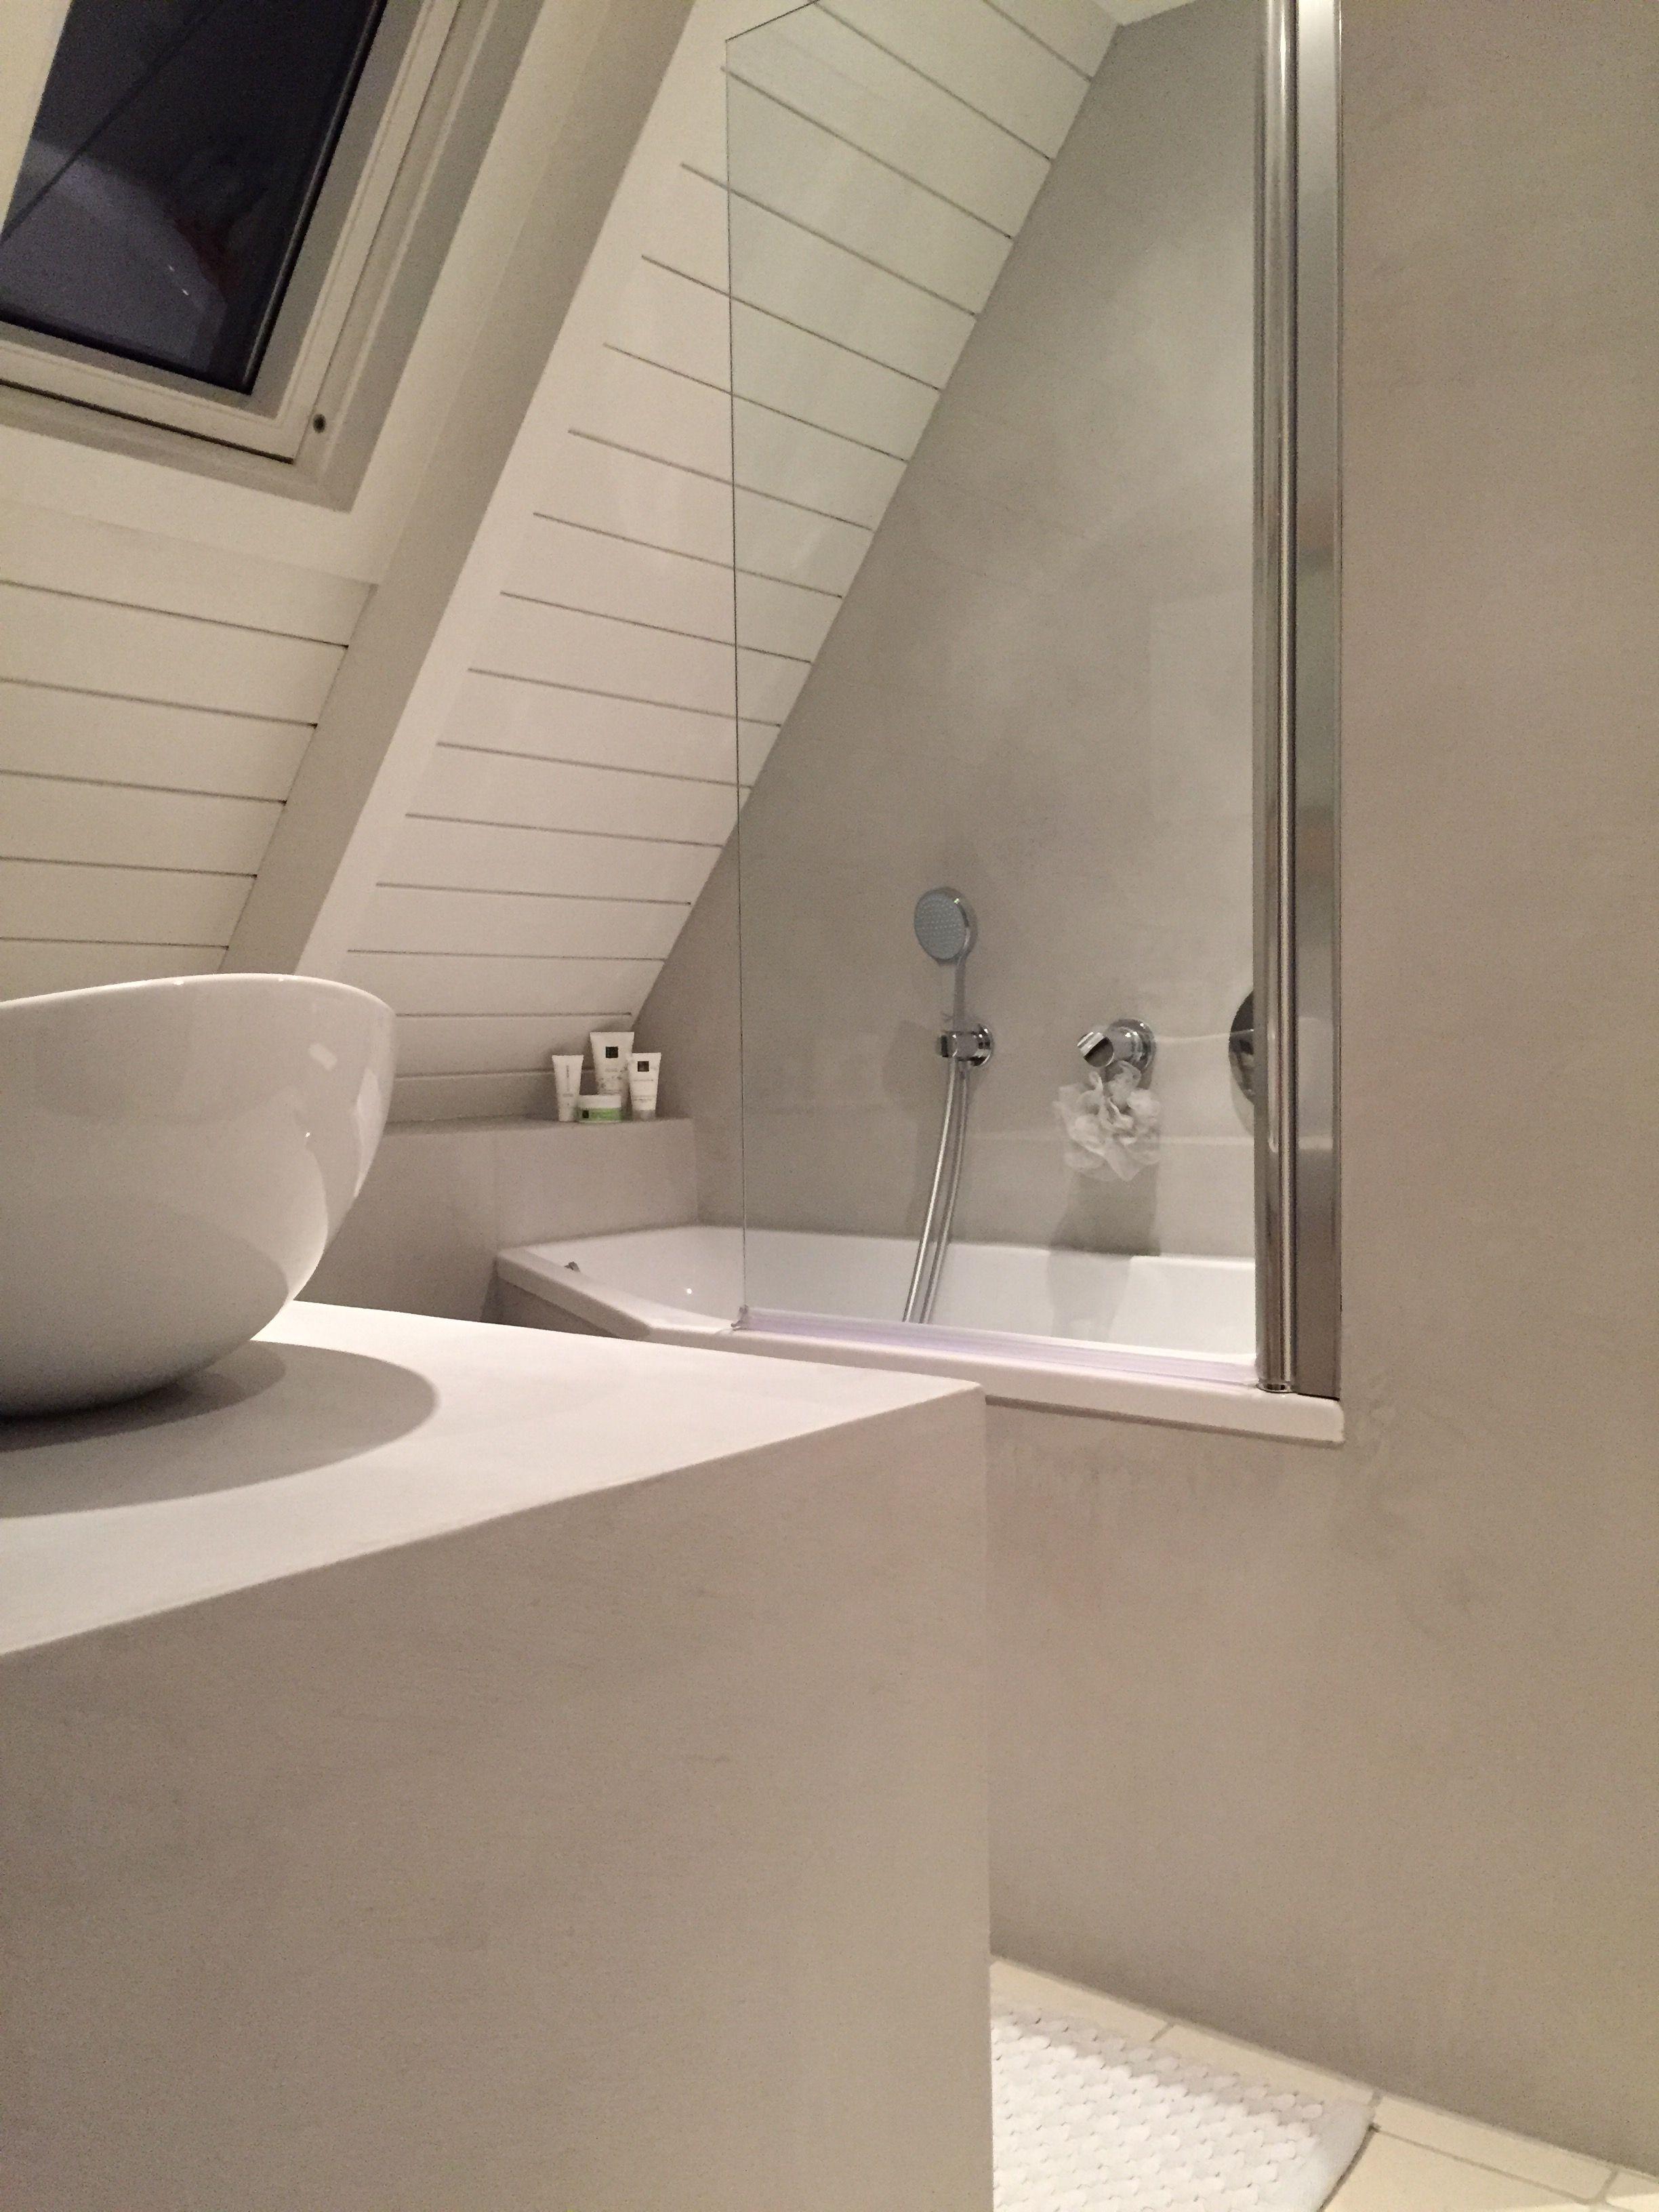 Badkamer beton cire kleur licht grijs [JB] | Project badkamer beton ...